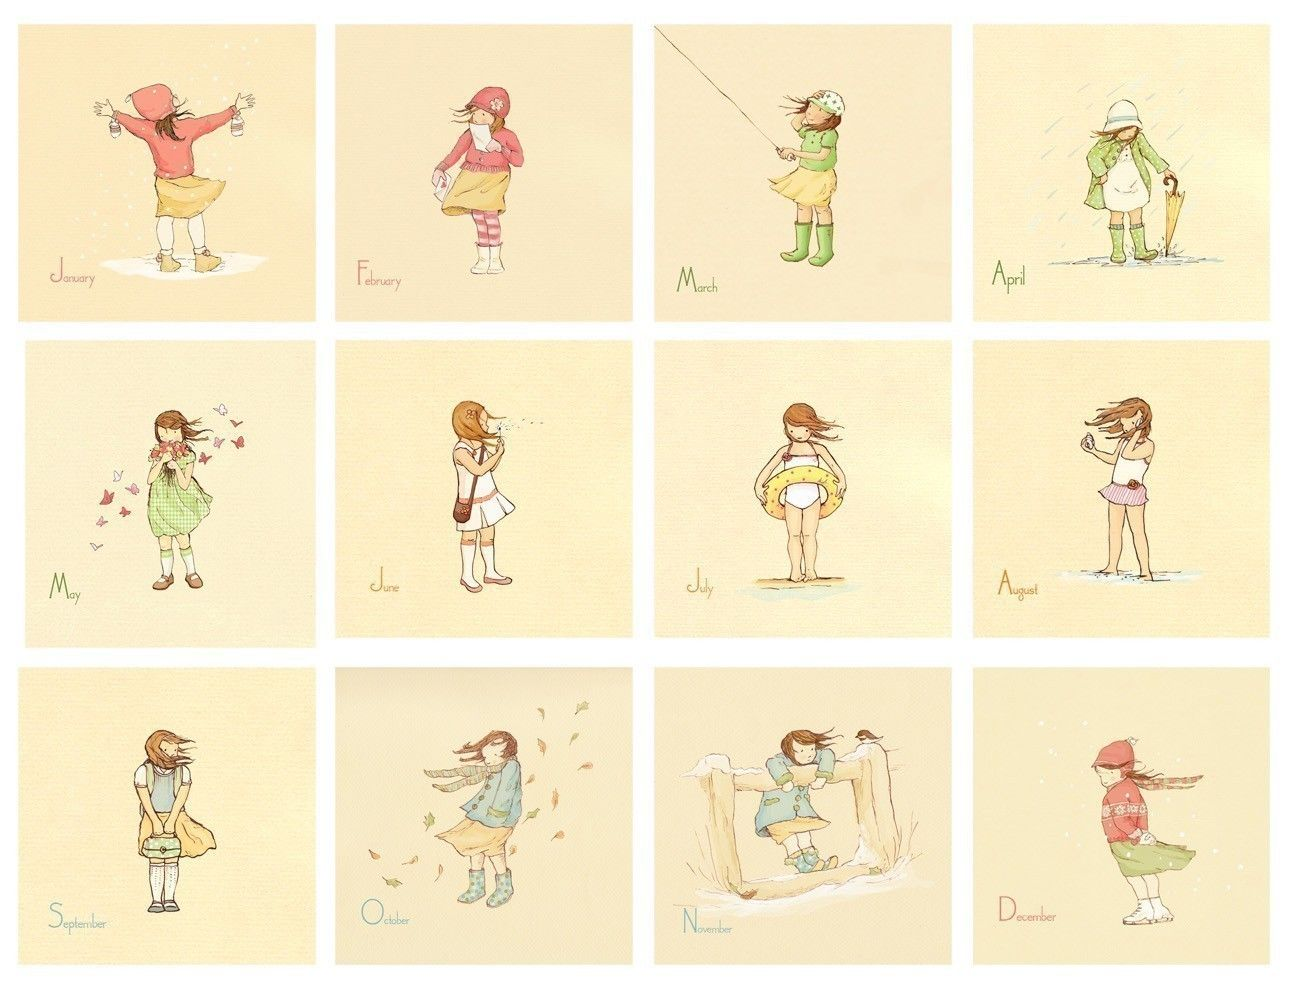 Kinder WandKunstdrucke ihr Monat fr MonatSET 12 8x8s  Postkarten  Pinterest  Kalender